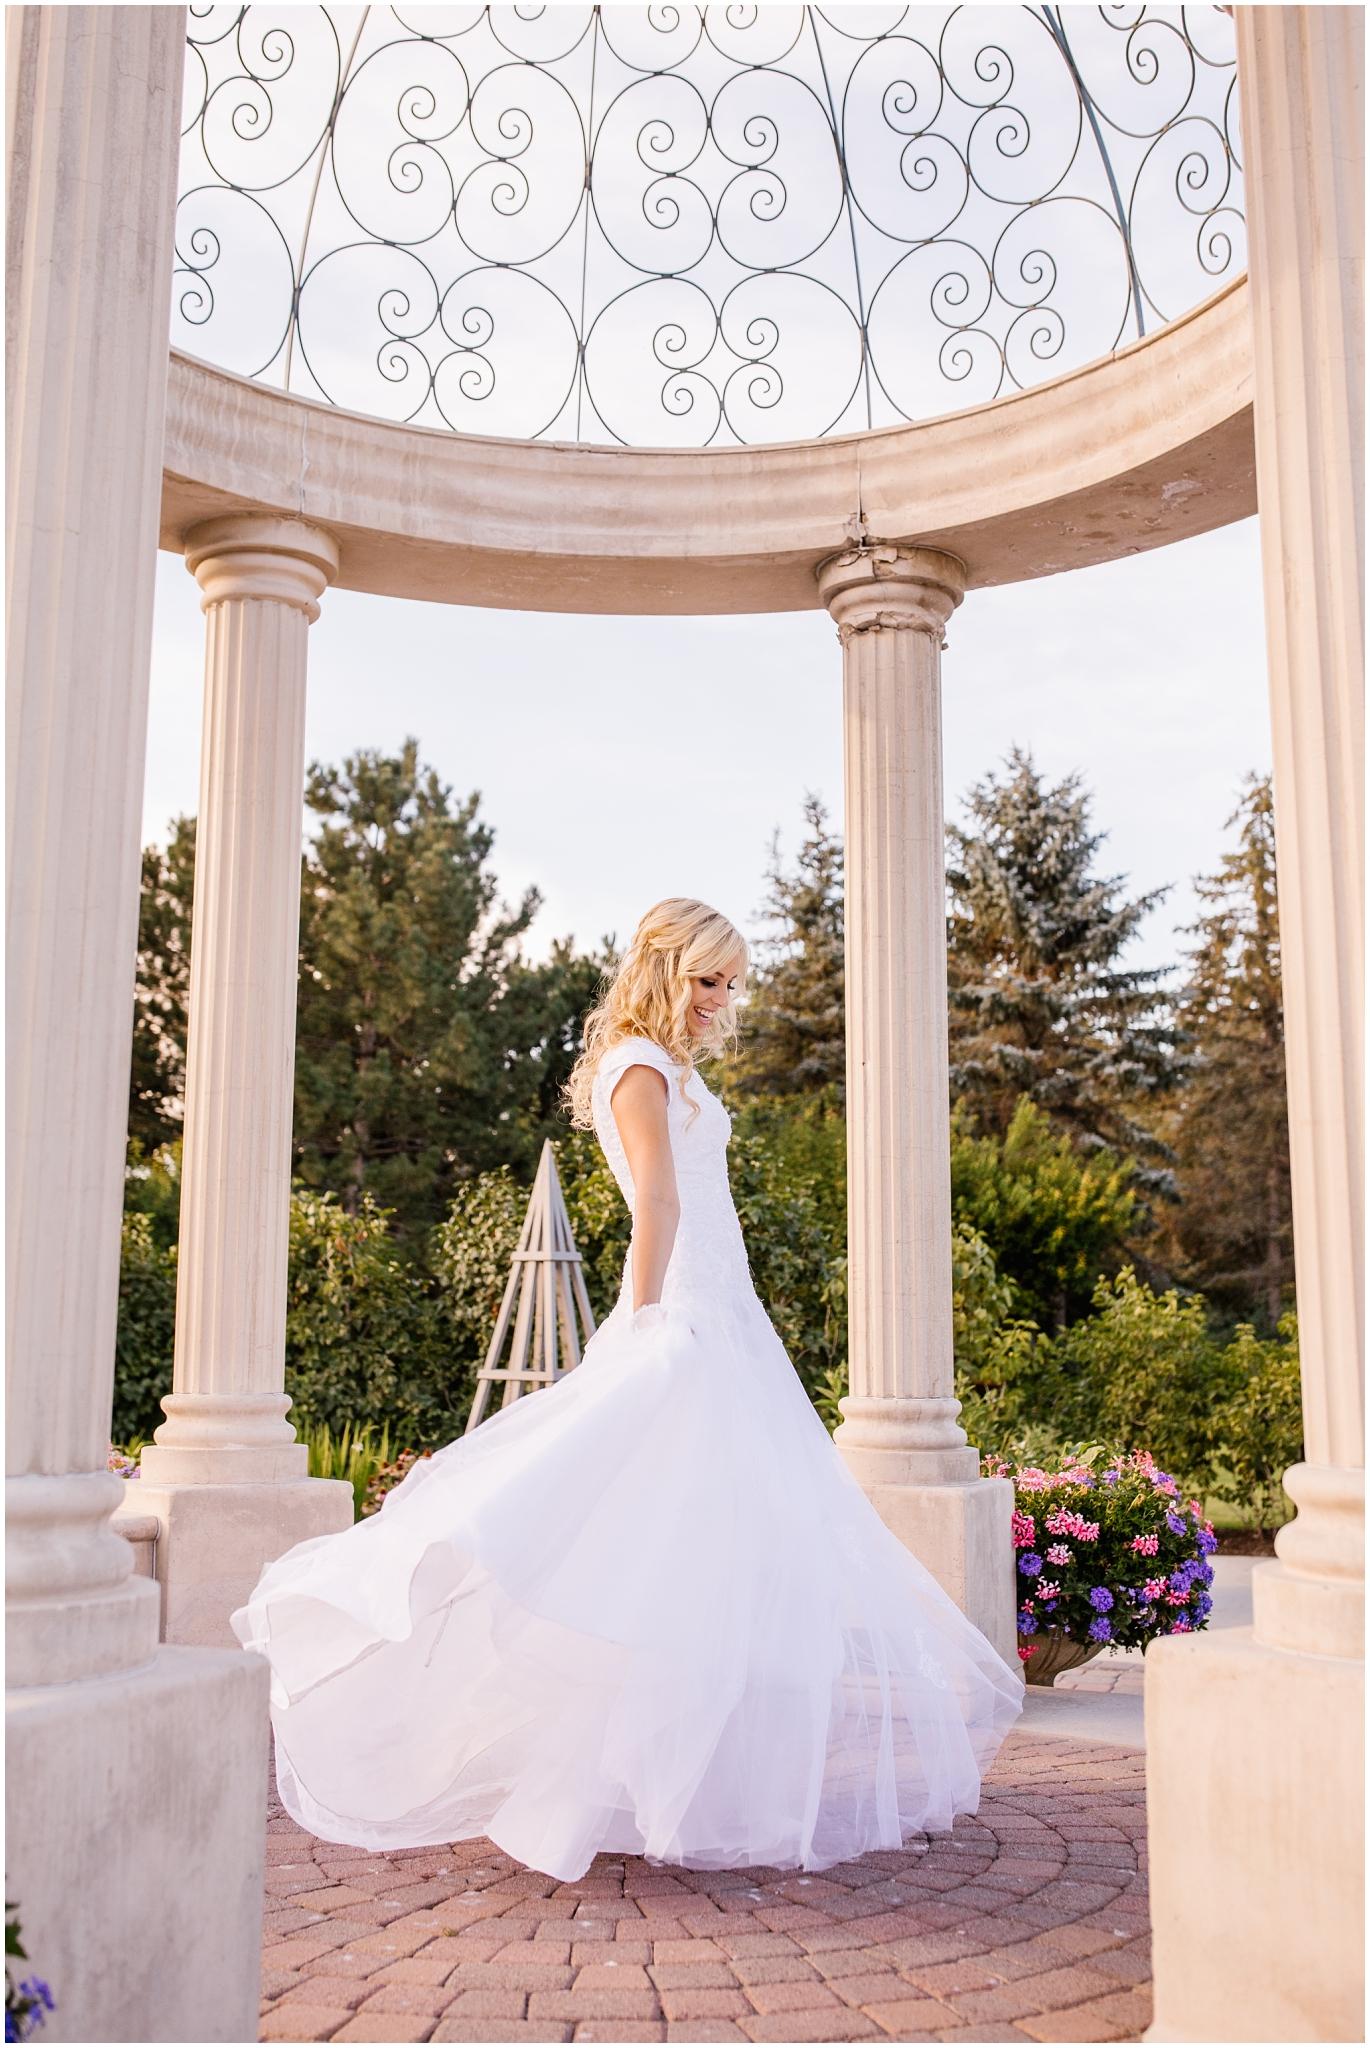 CHBridals-44_Lizzie-B-Imagery-Utah-Wedding-Photographer-Salt-Lake-City-Park-City-Thanksgiving-Point-Ashton-Gardens.jpg